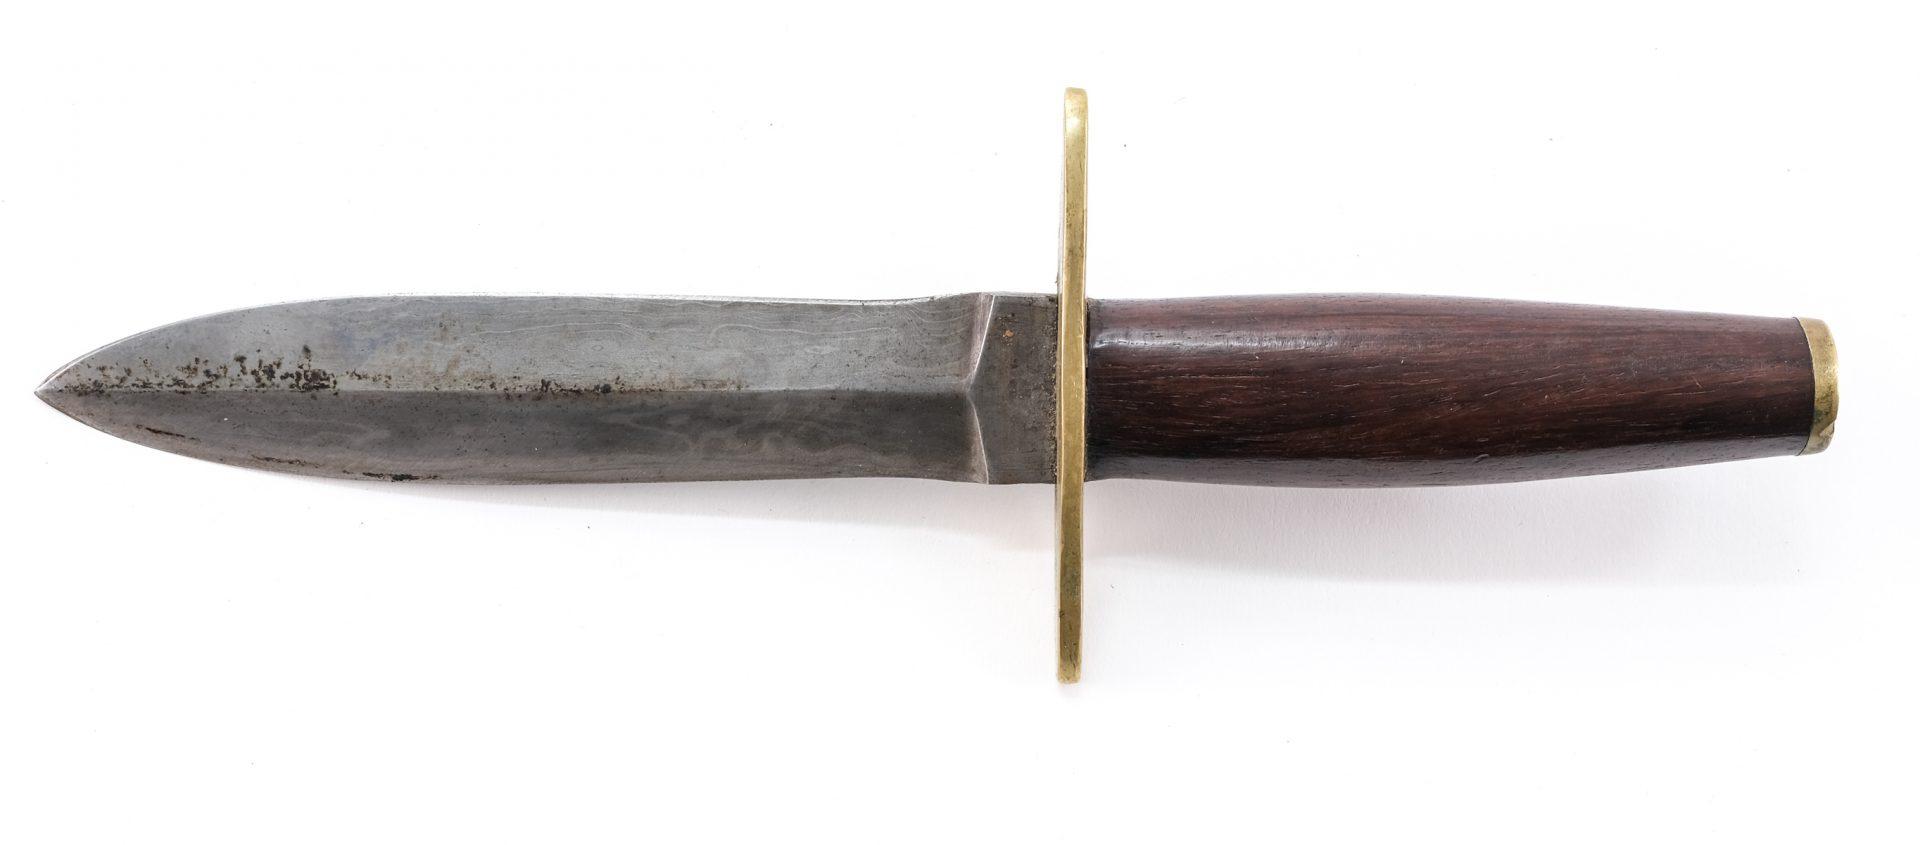 Three Sheath Knives: Dickson, Gerber, Case